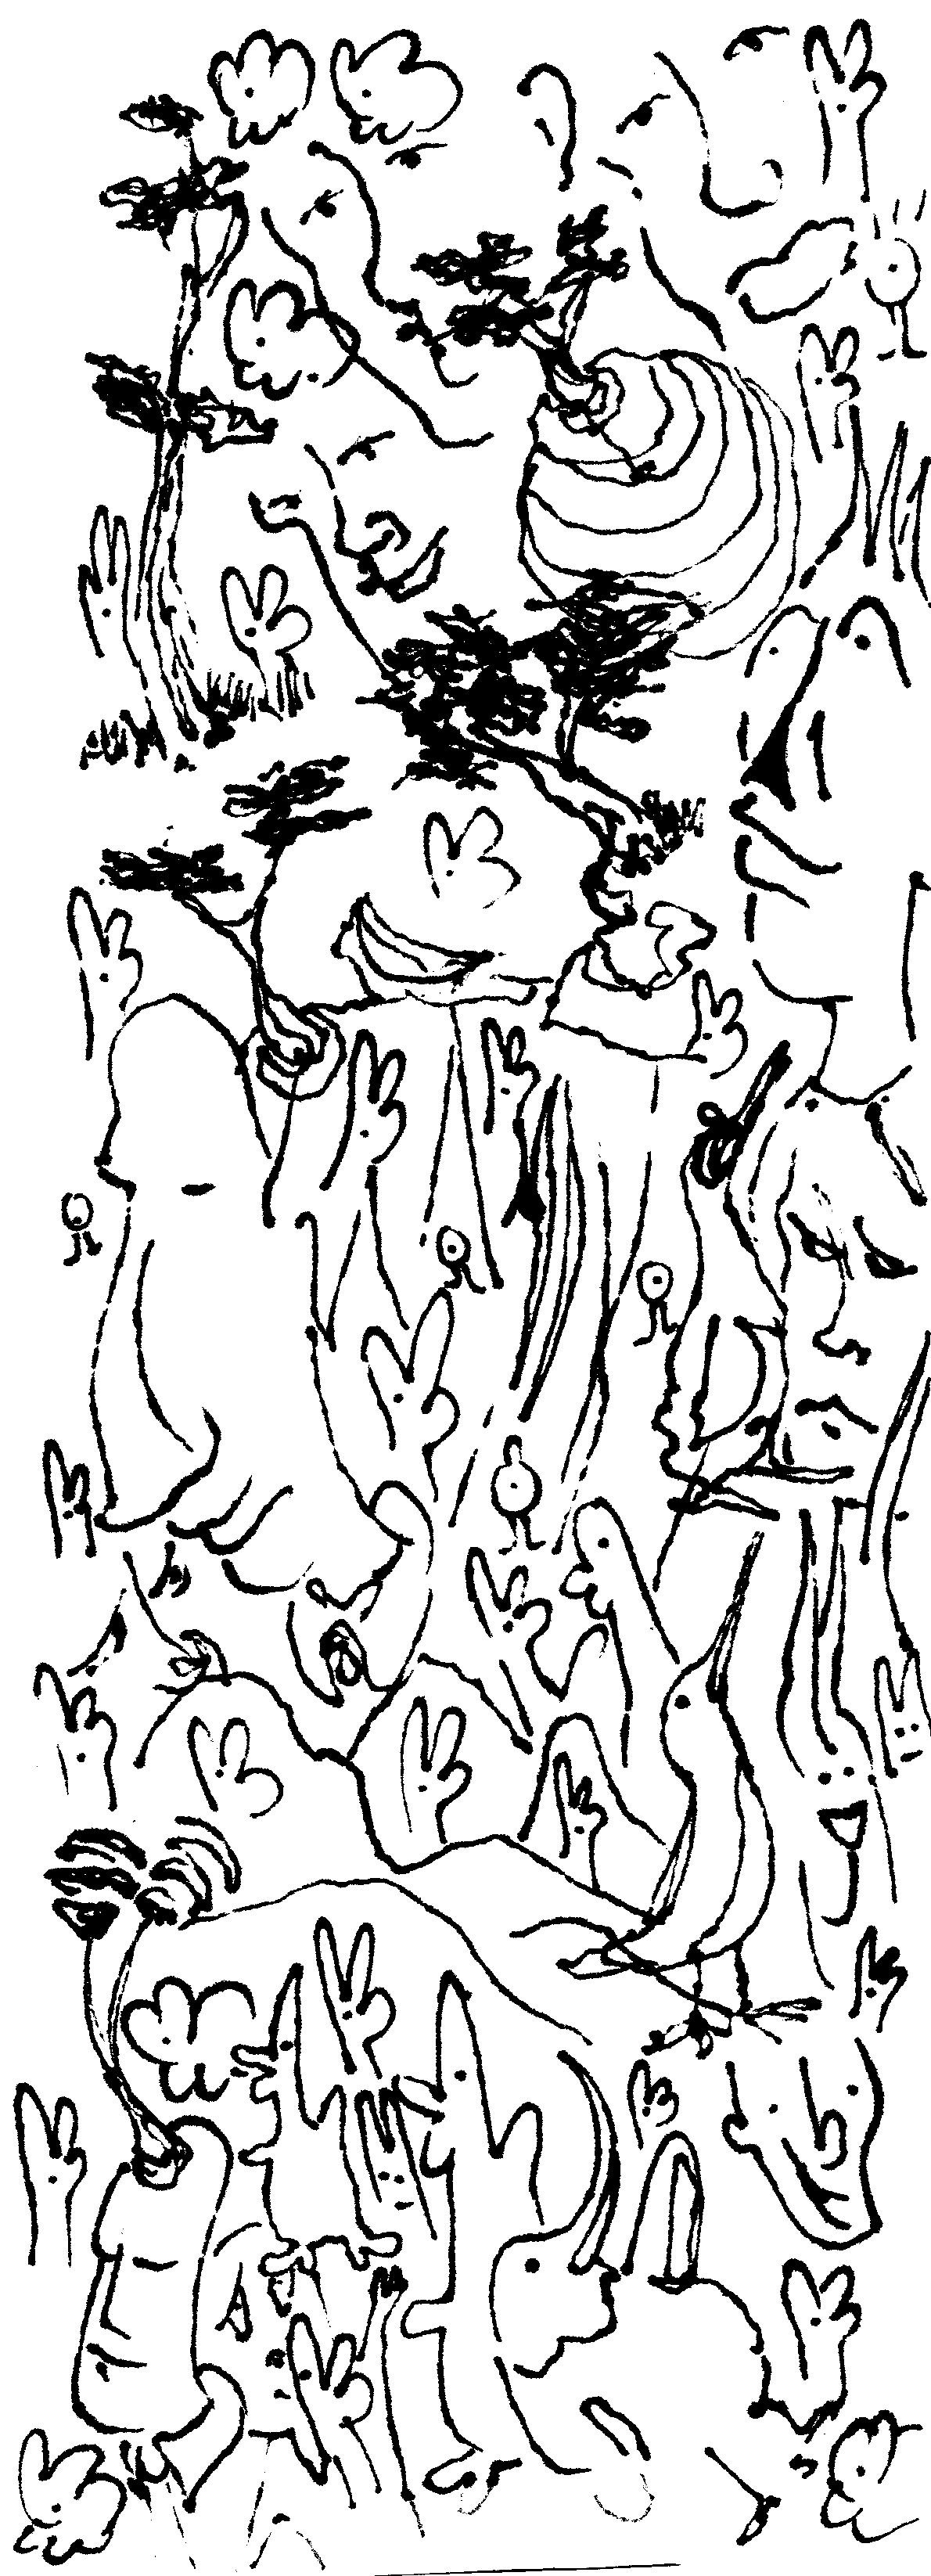 doodles fernandez